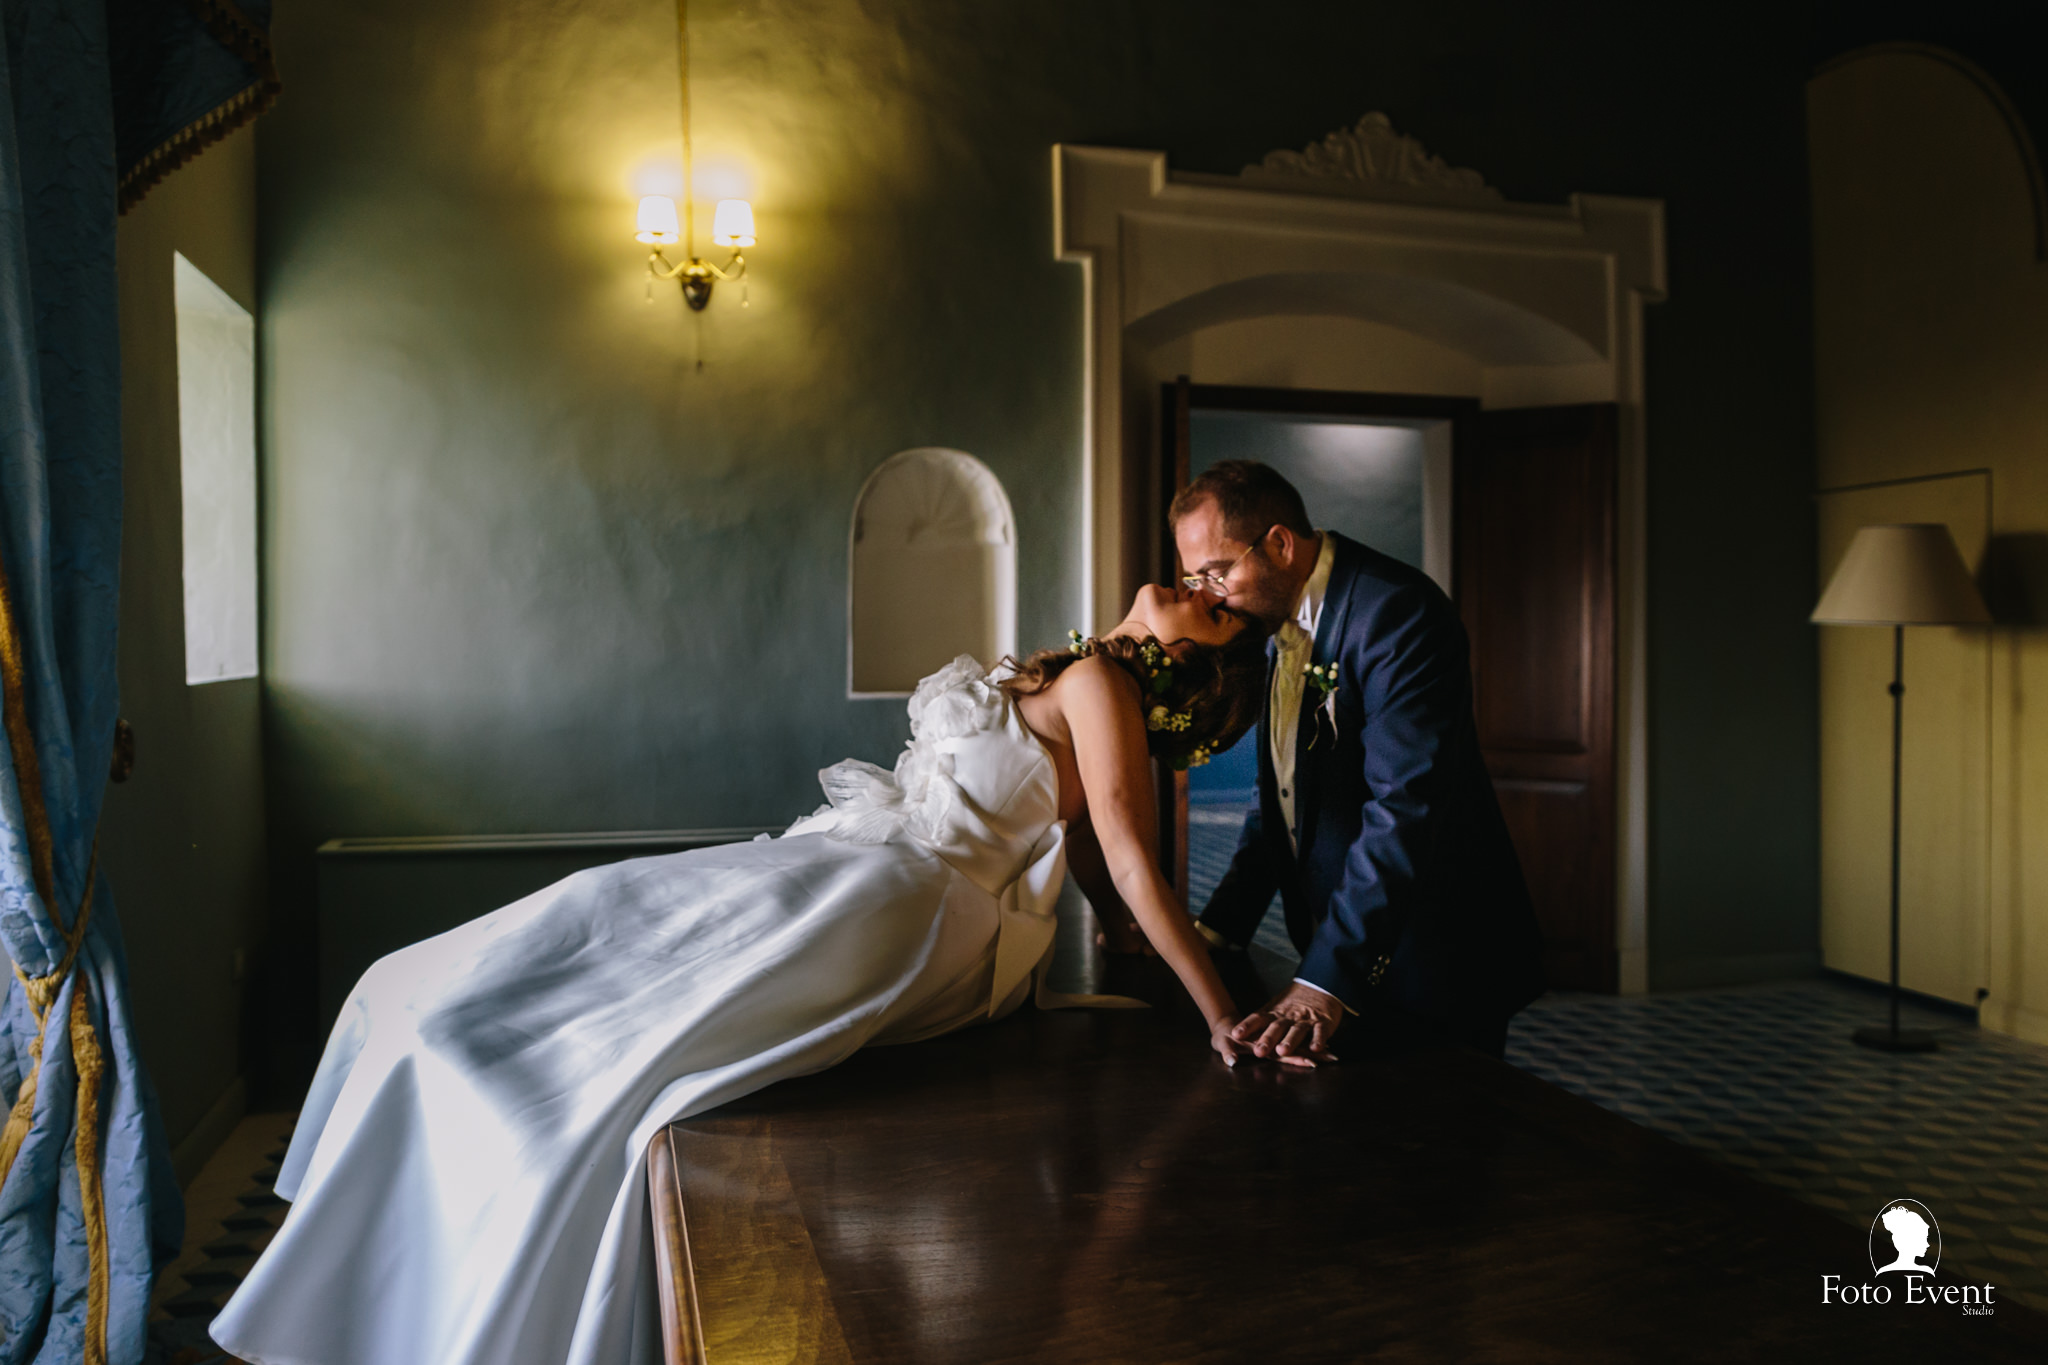 046-2020-10-15-Matrimonio-Noemi-e-Salvatore-Paterno-5DE-1858-Edit